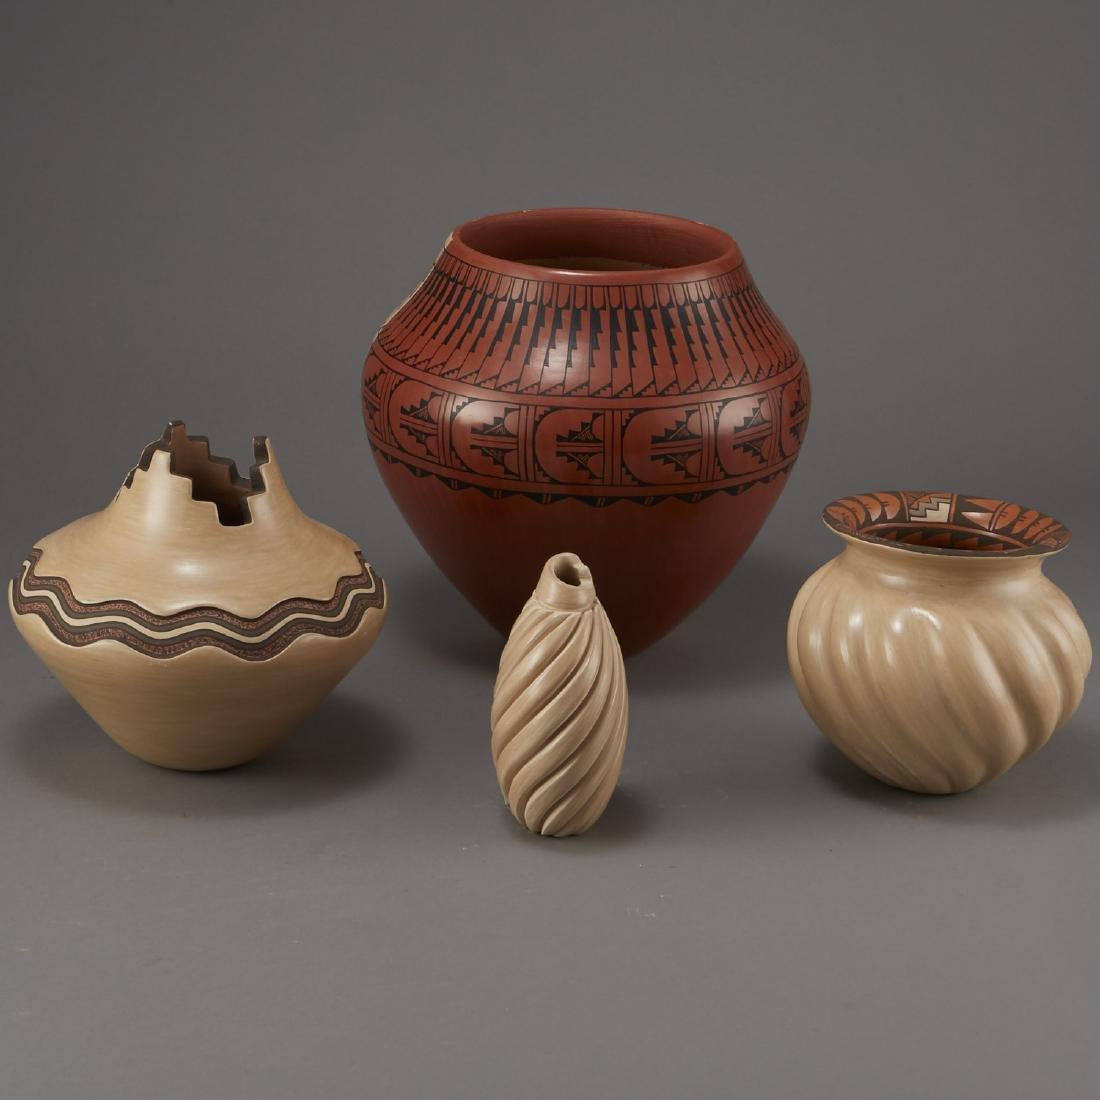 Group of Jemez Pottery Yepa and Fragua - 4